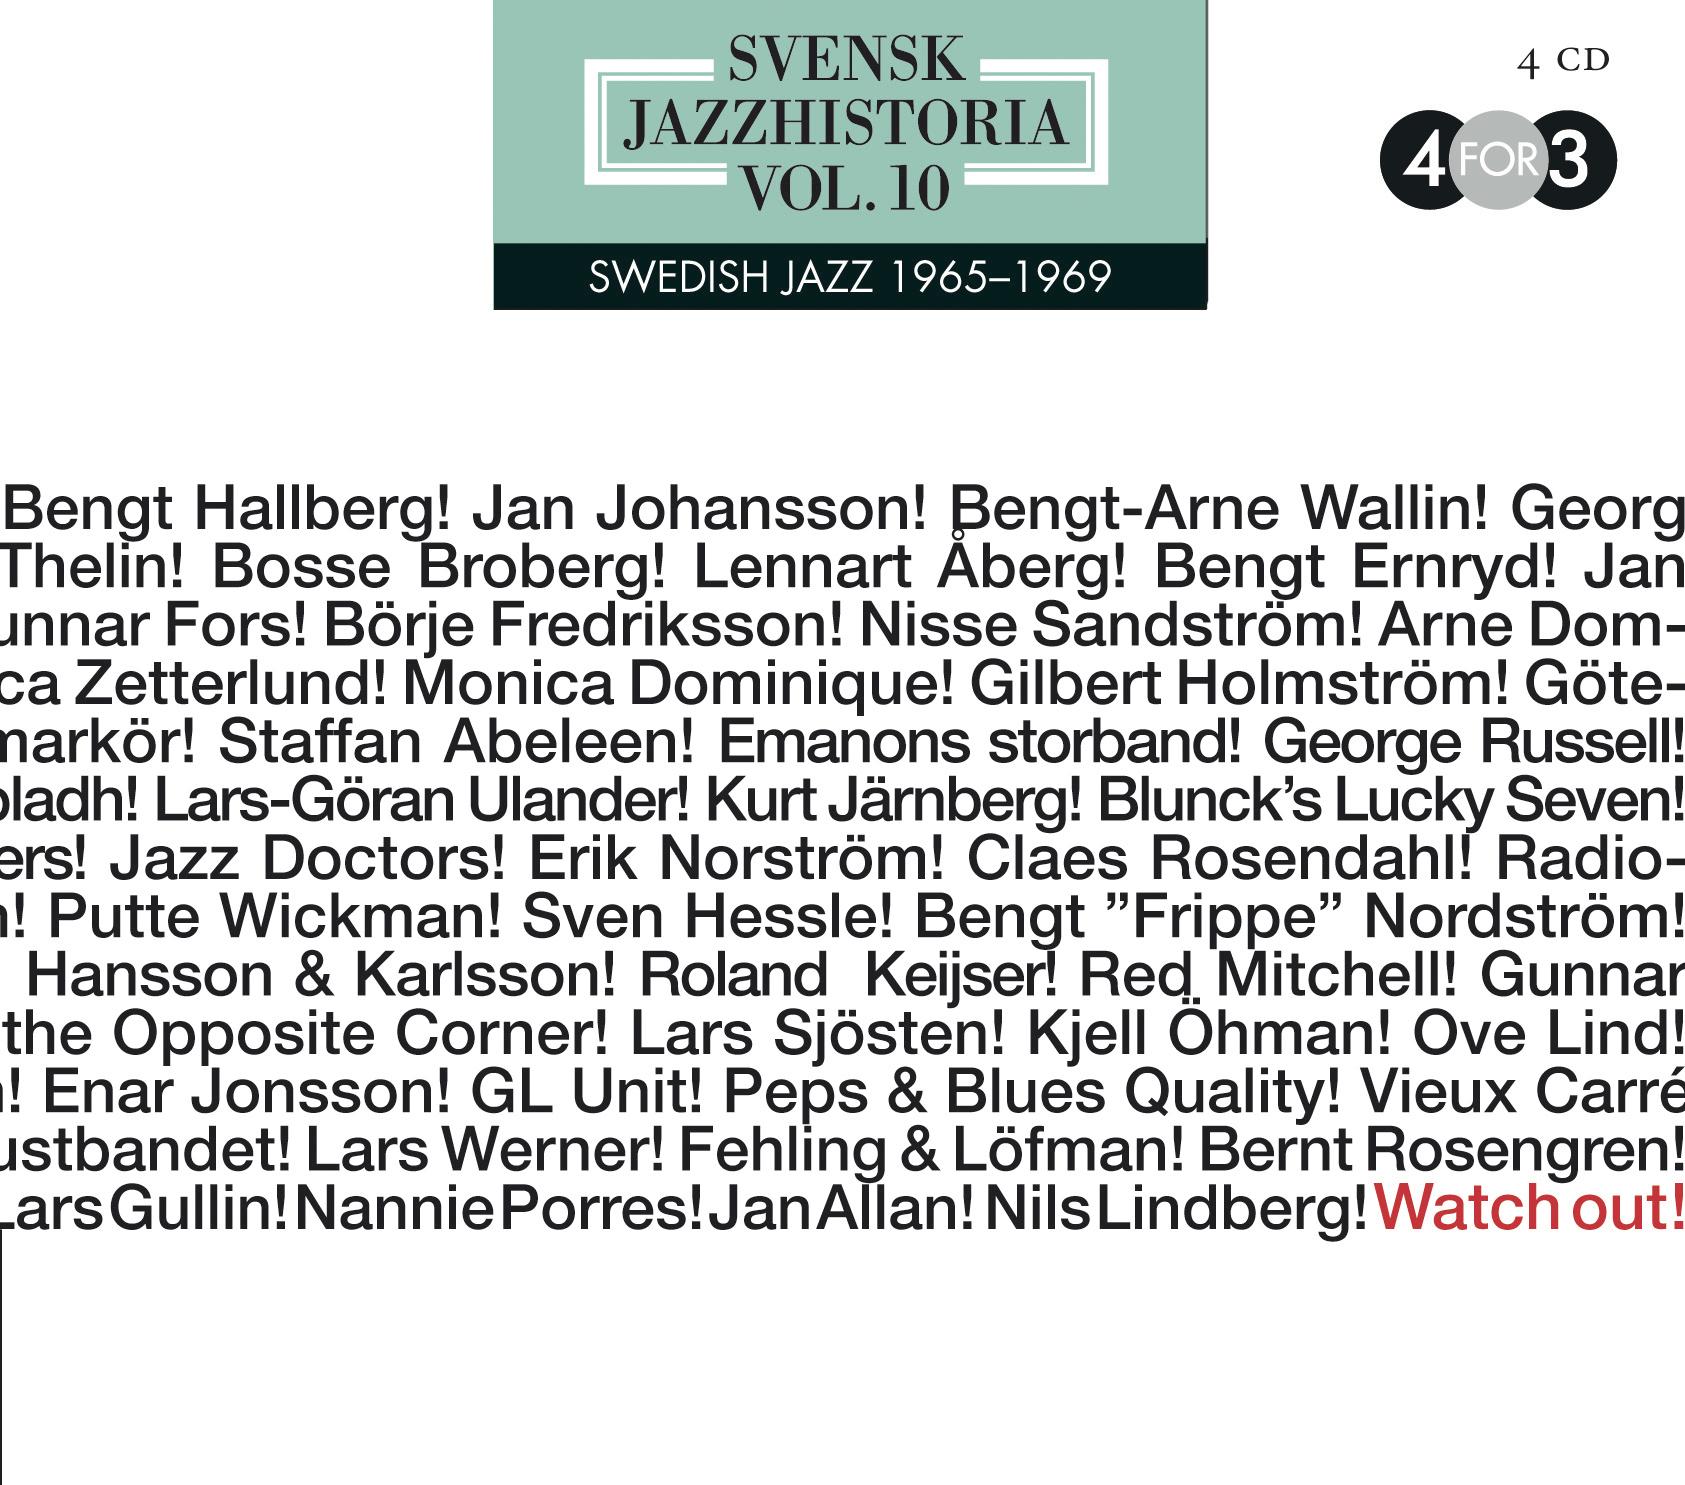 Svensk jazzhistoria vol. 10, 1965-69